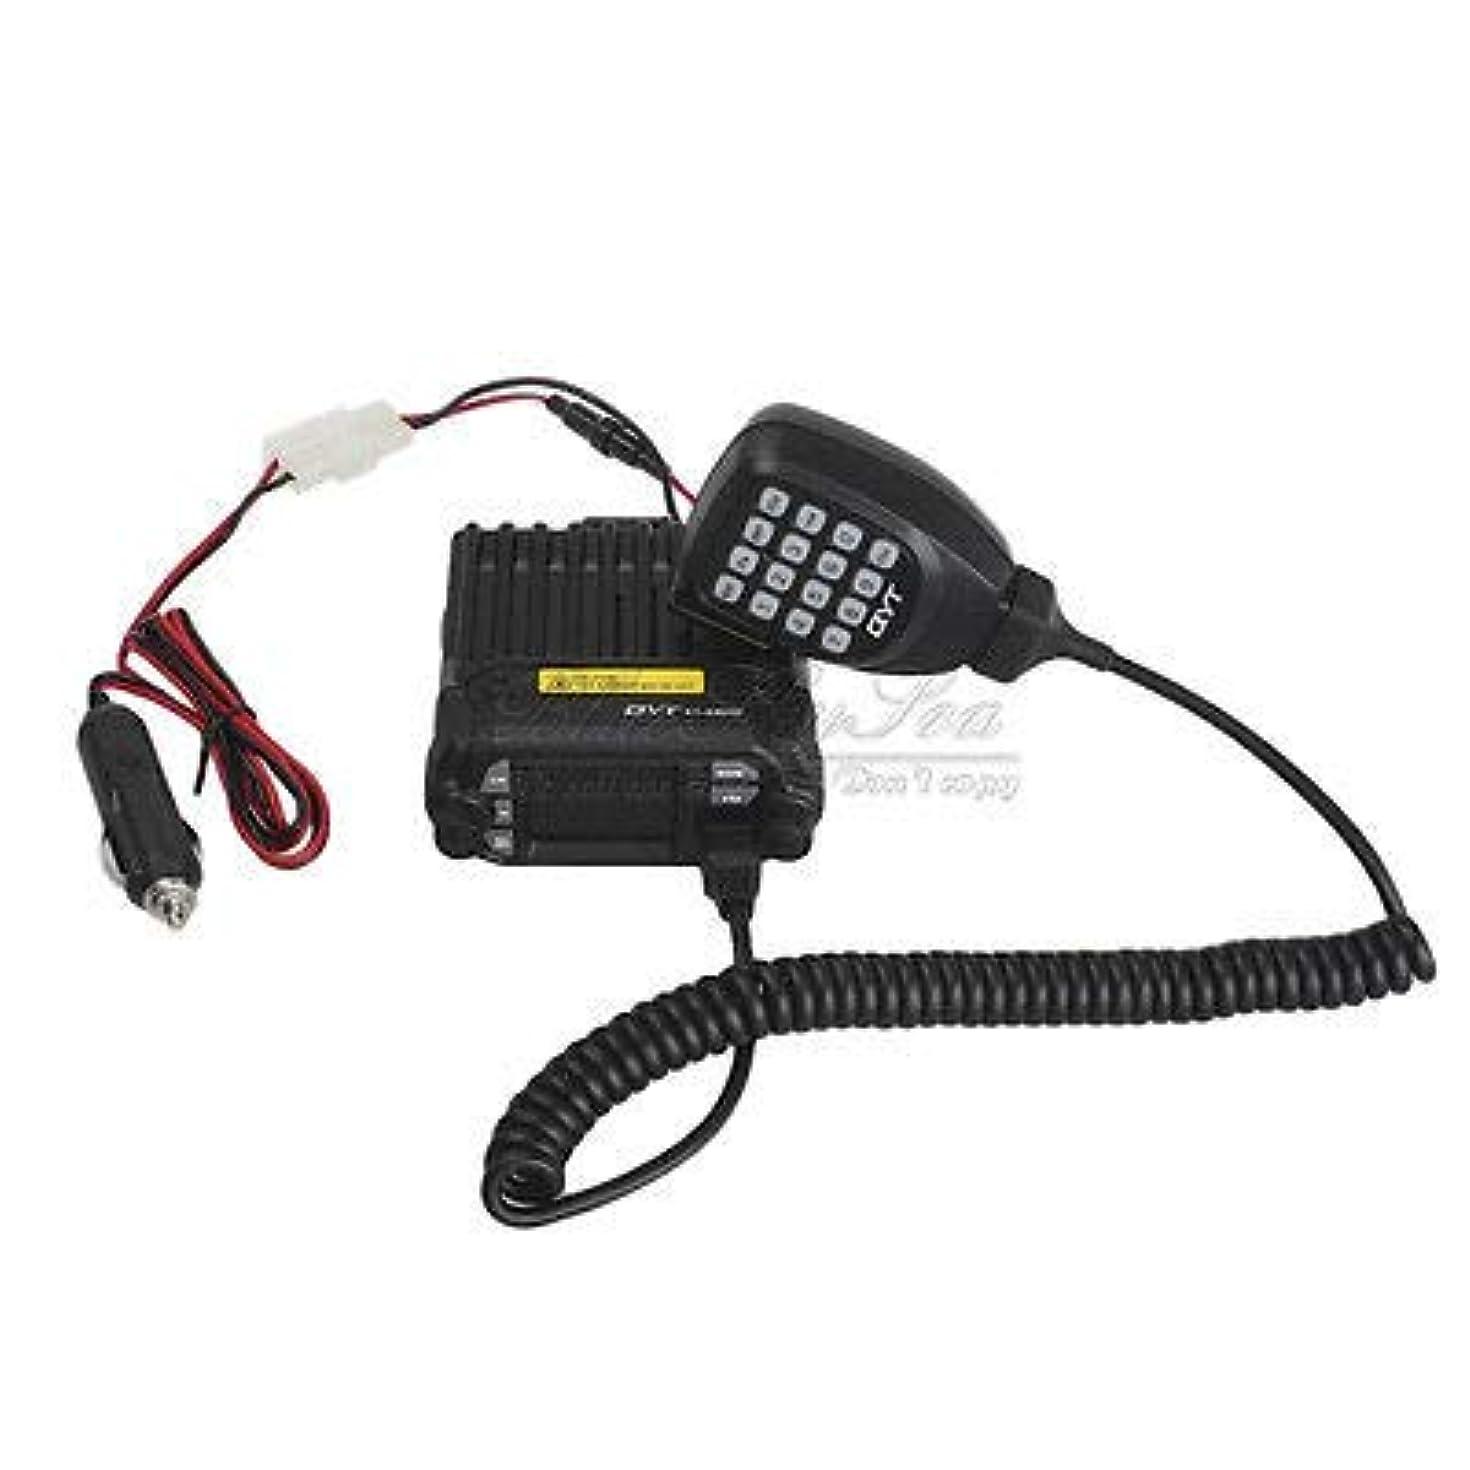 QYT KT-8900D Dual Band VHF UHF Mini Color Screen Quad-Standy 25W/20W Mobile Car Radio 2 Way Radios Walkie Talkie Car Mobile Radio Radios FM (Mic is top of Radio)